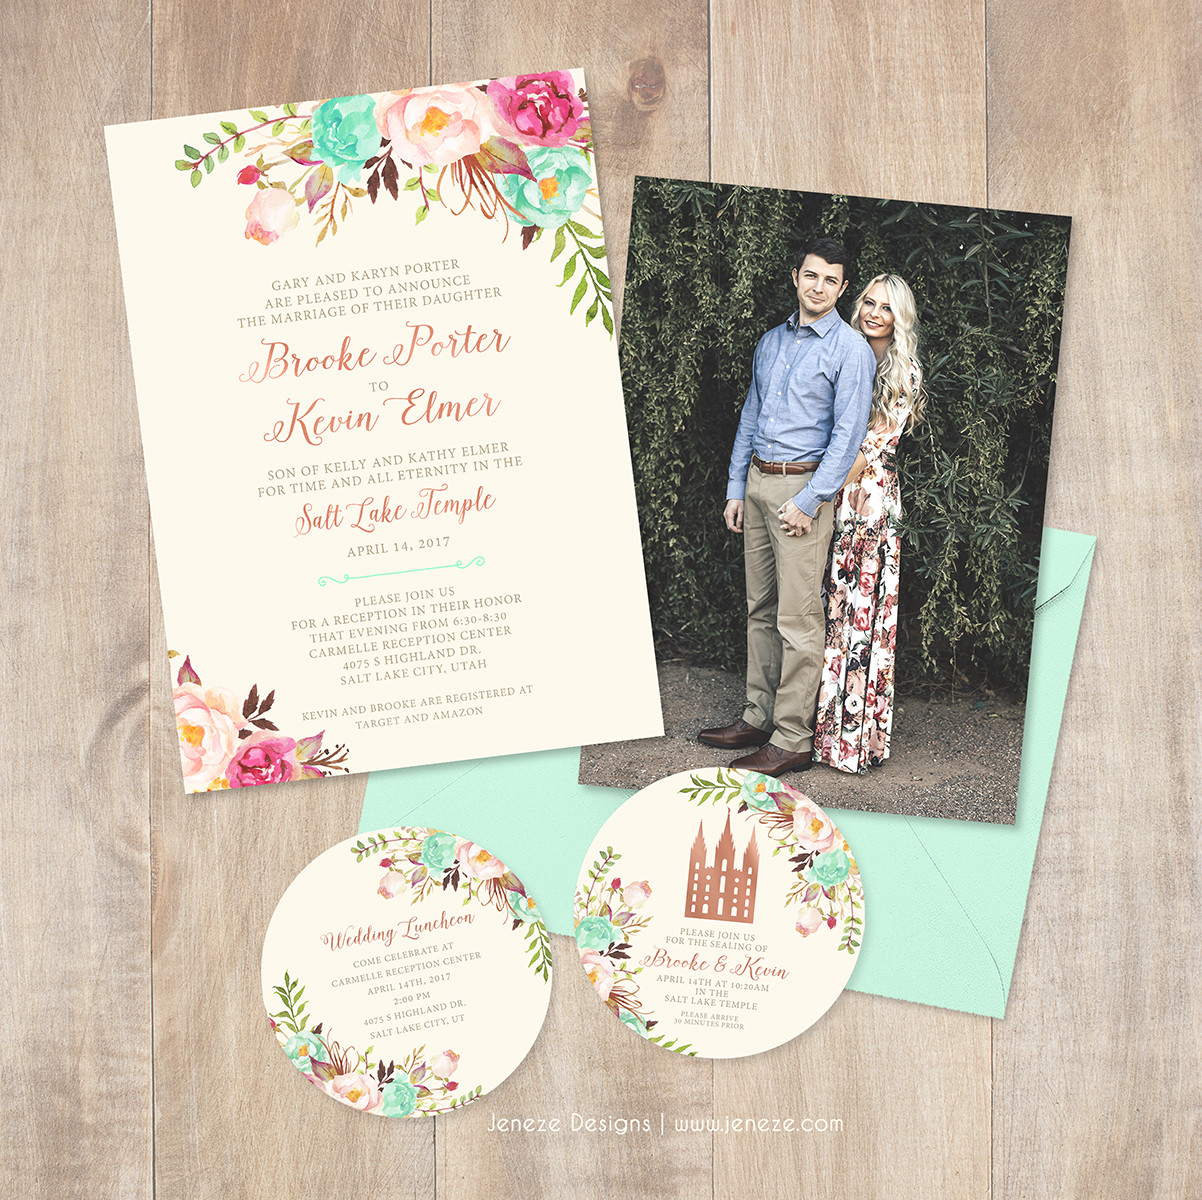 Jeneze Designs Custom Wedding Invitations | INVITATIONS